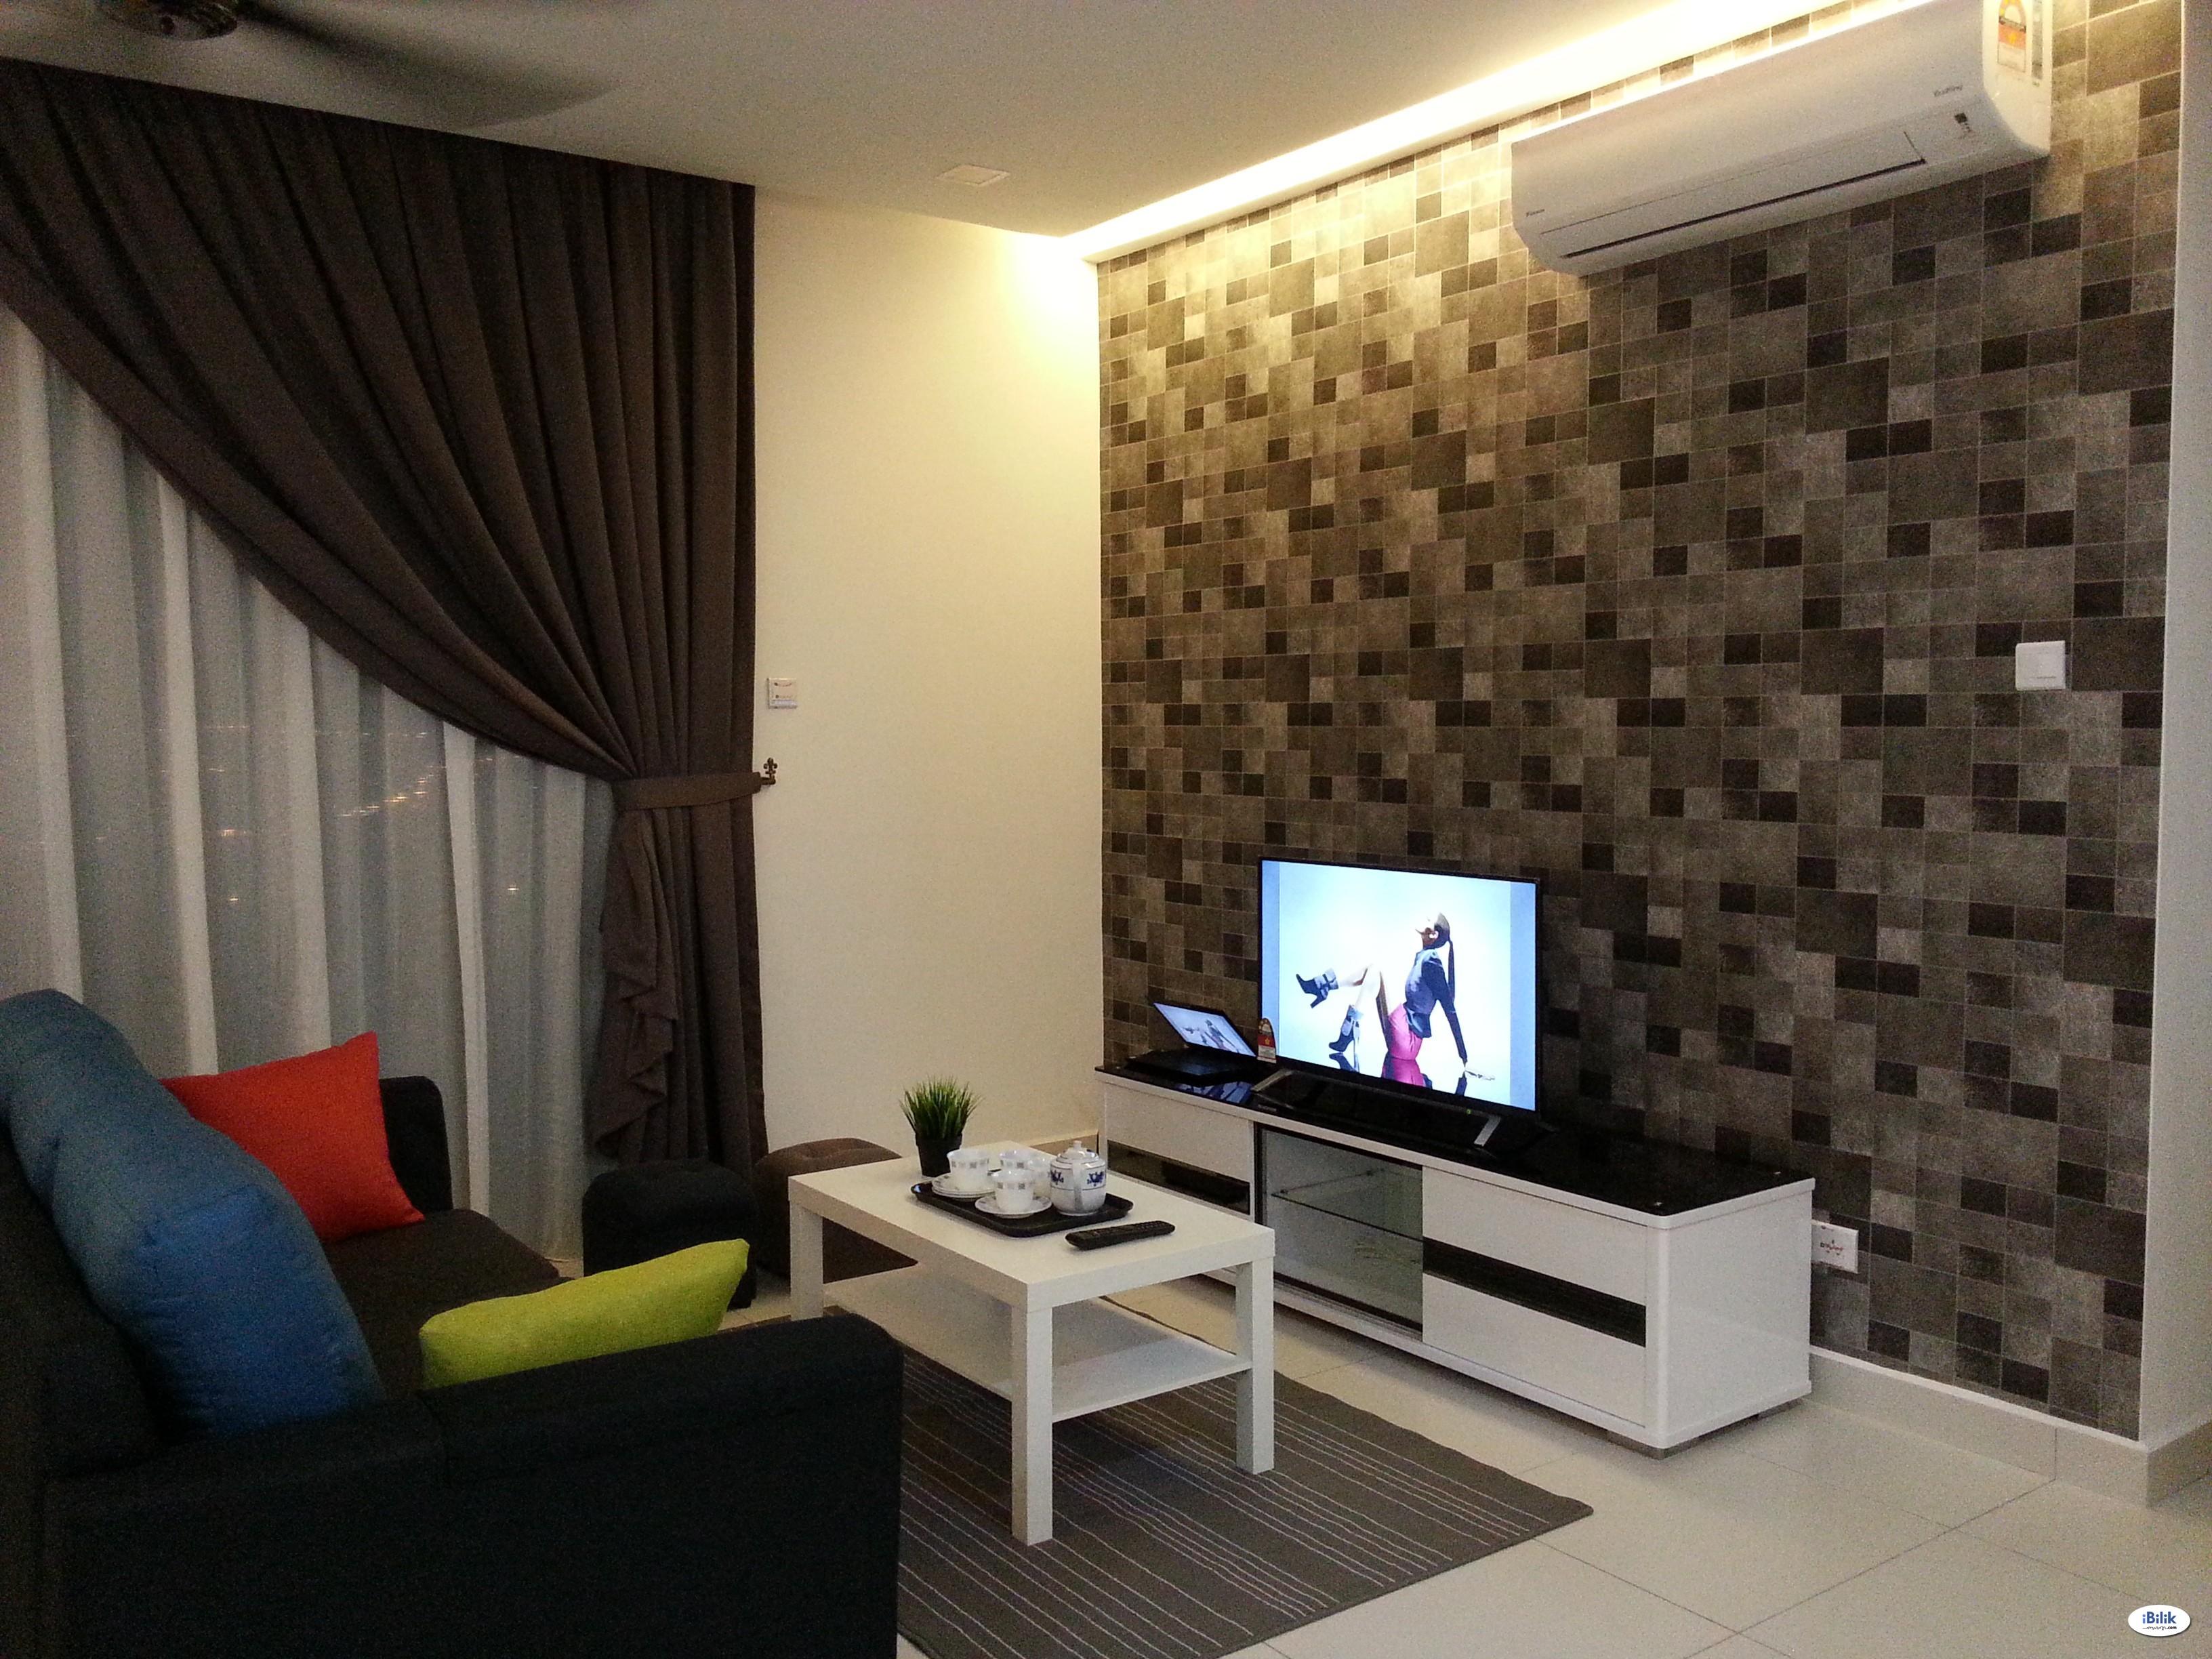 Middle Room at Cristal Residence, Cyberjaya